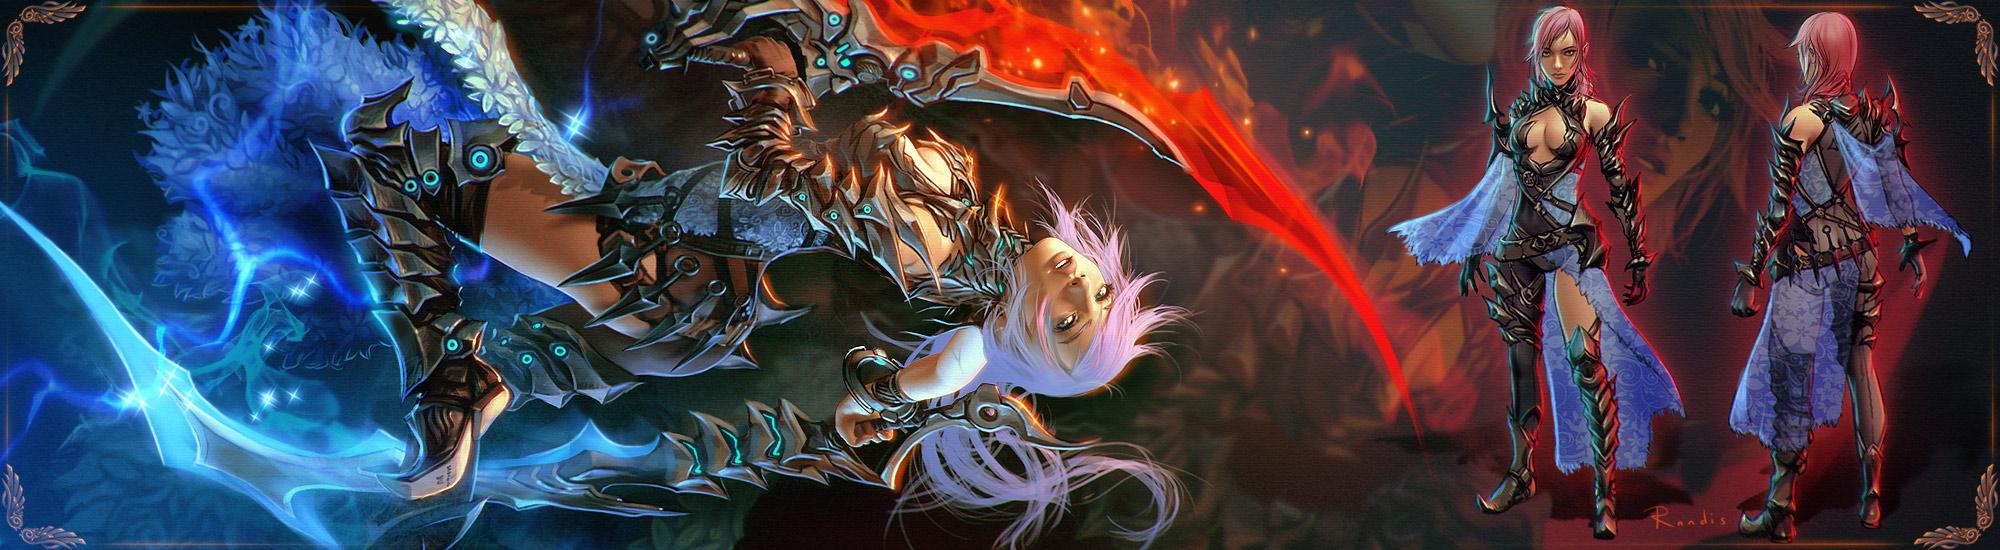 Lightning - Mythril Scorpion Armor by randis